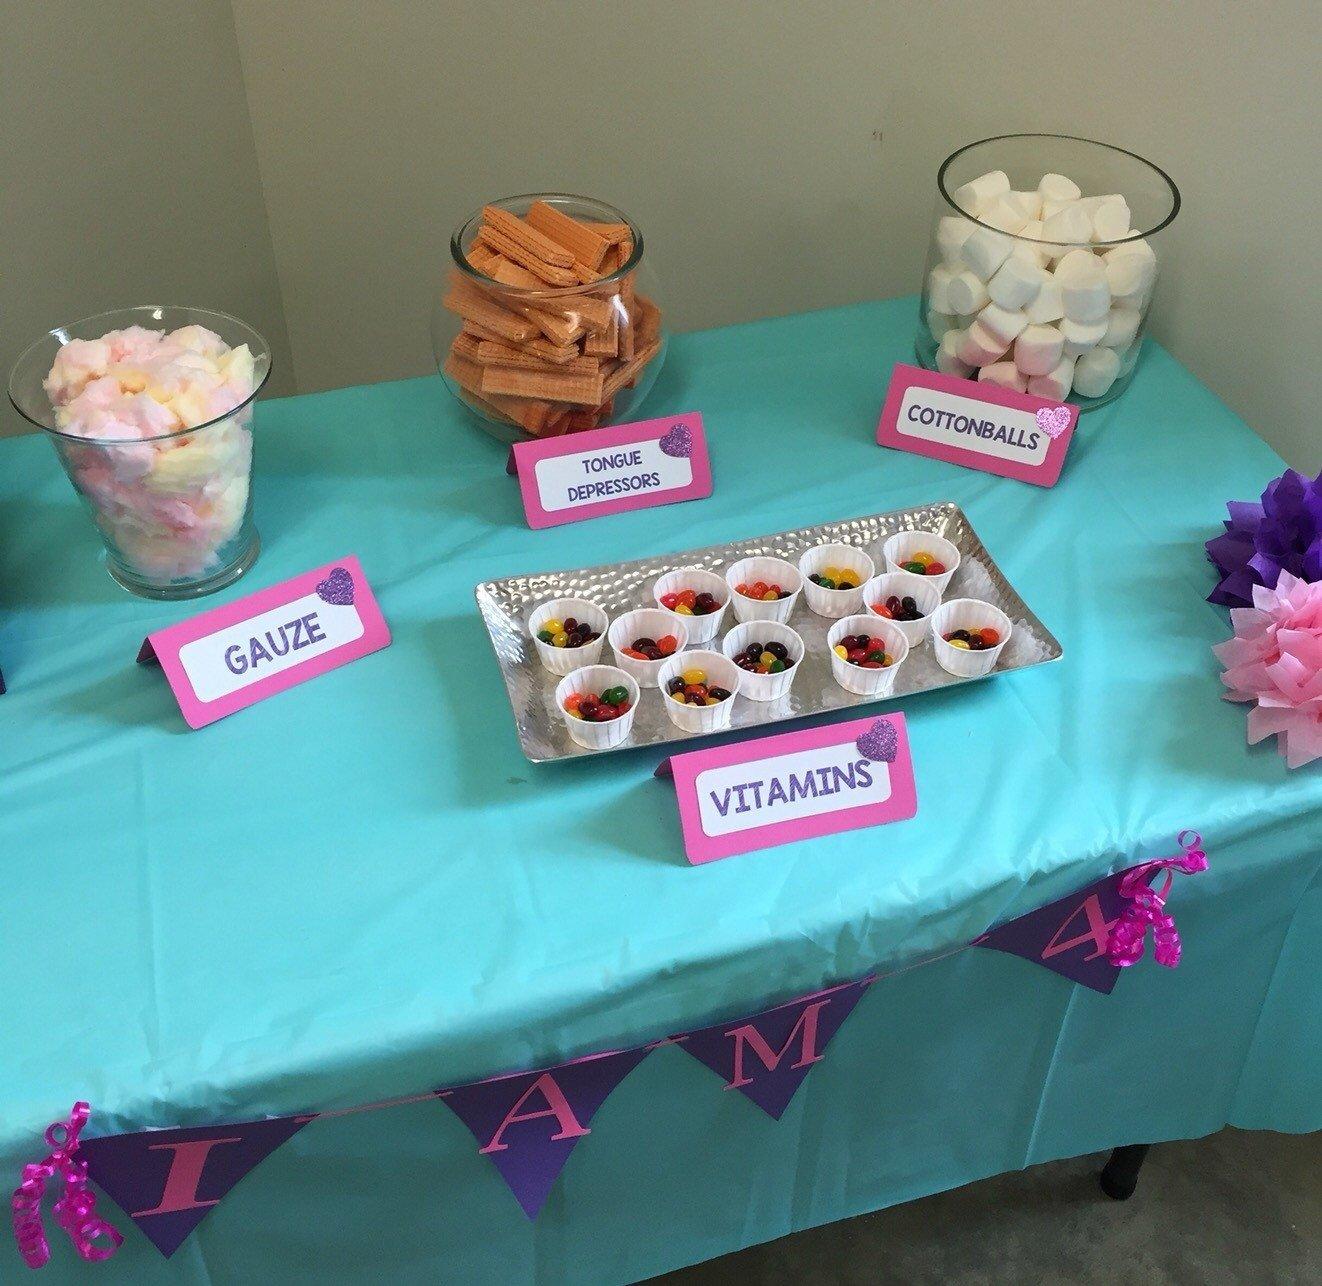 10 Spectacular Doc Mcstuffin Birthday Party Ideas doc mcstuffins birthday party decoration personalized doc